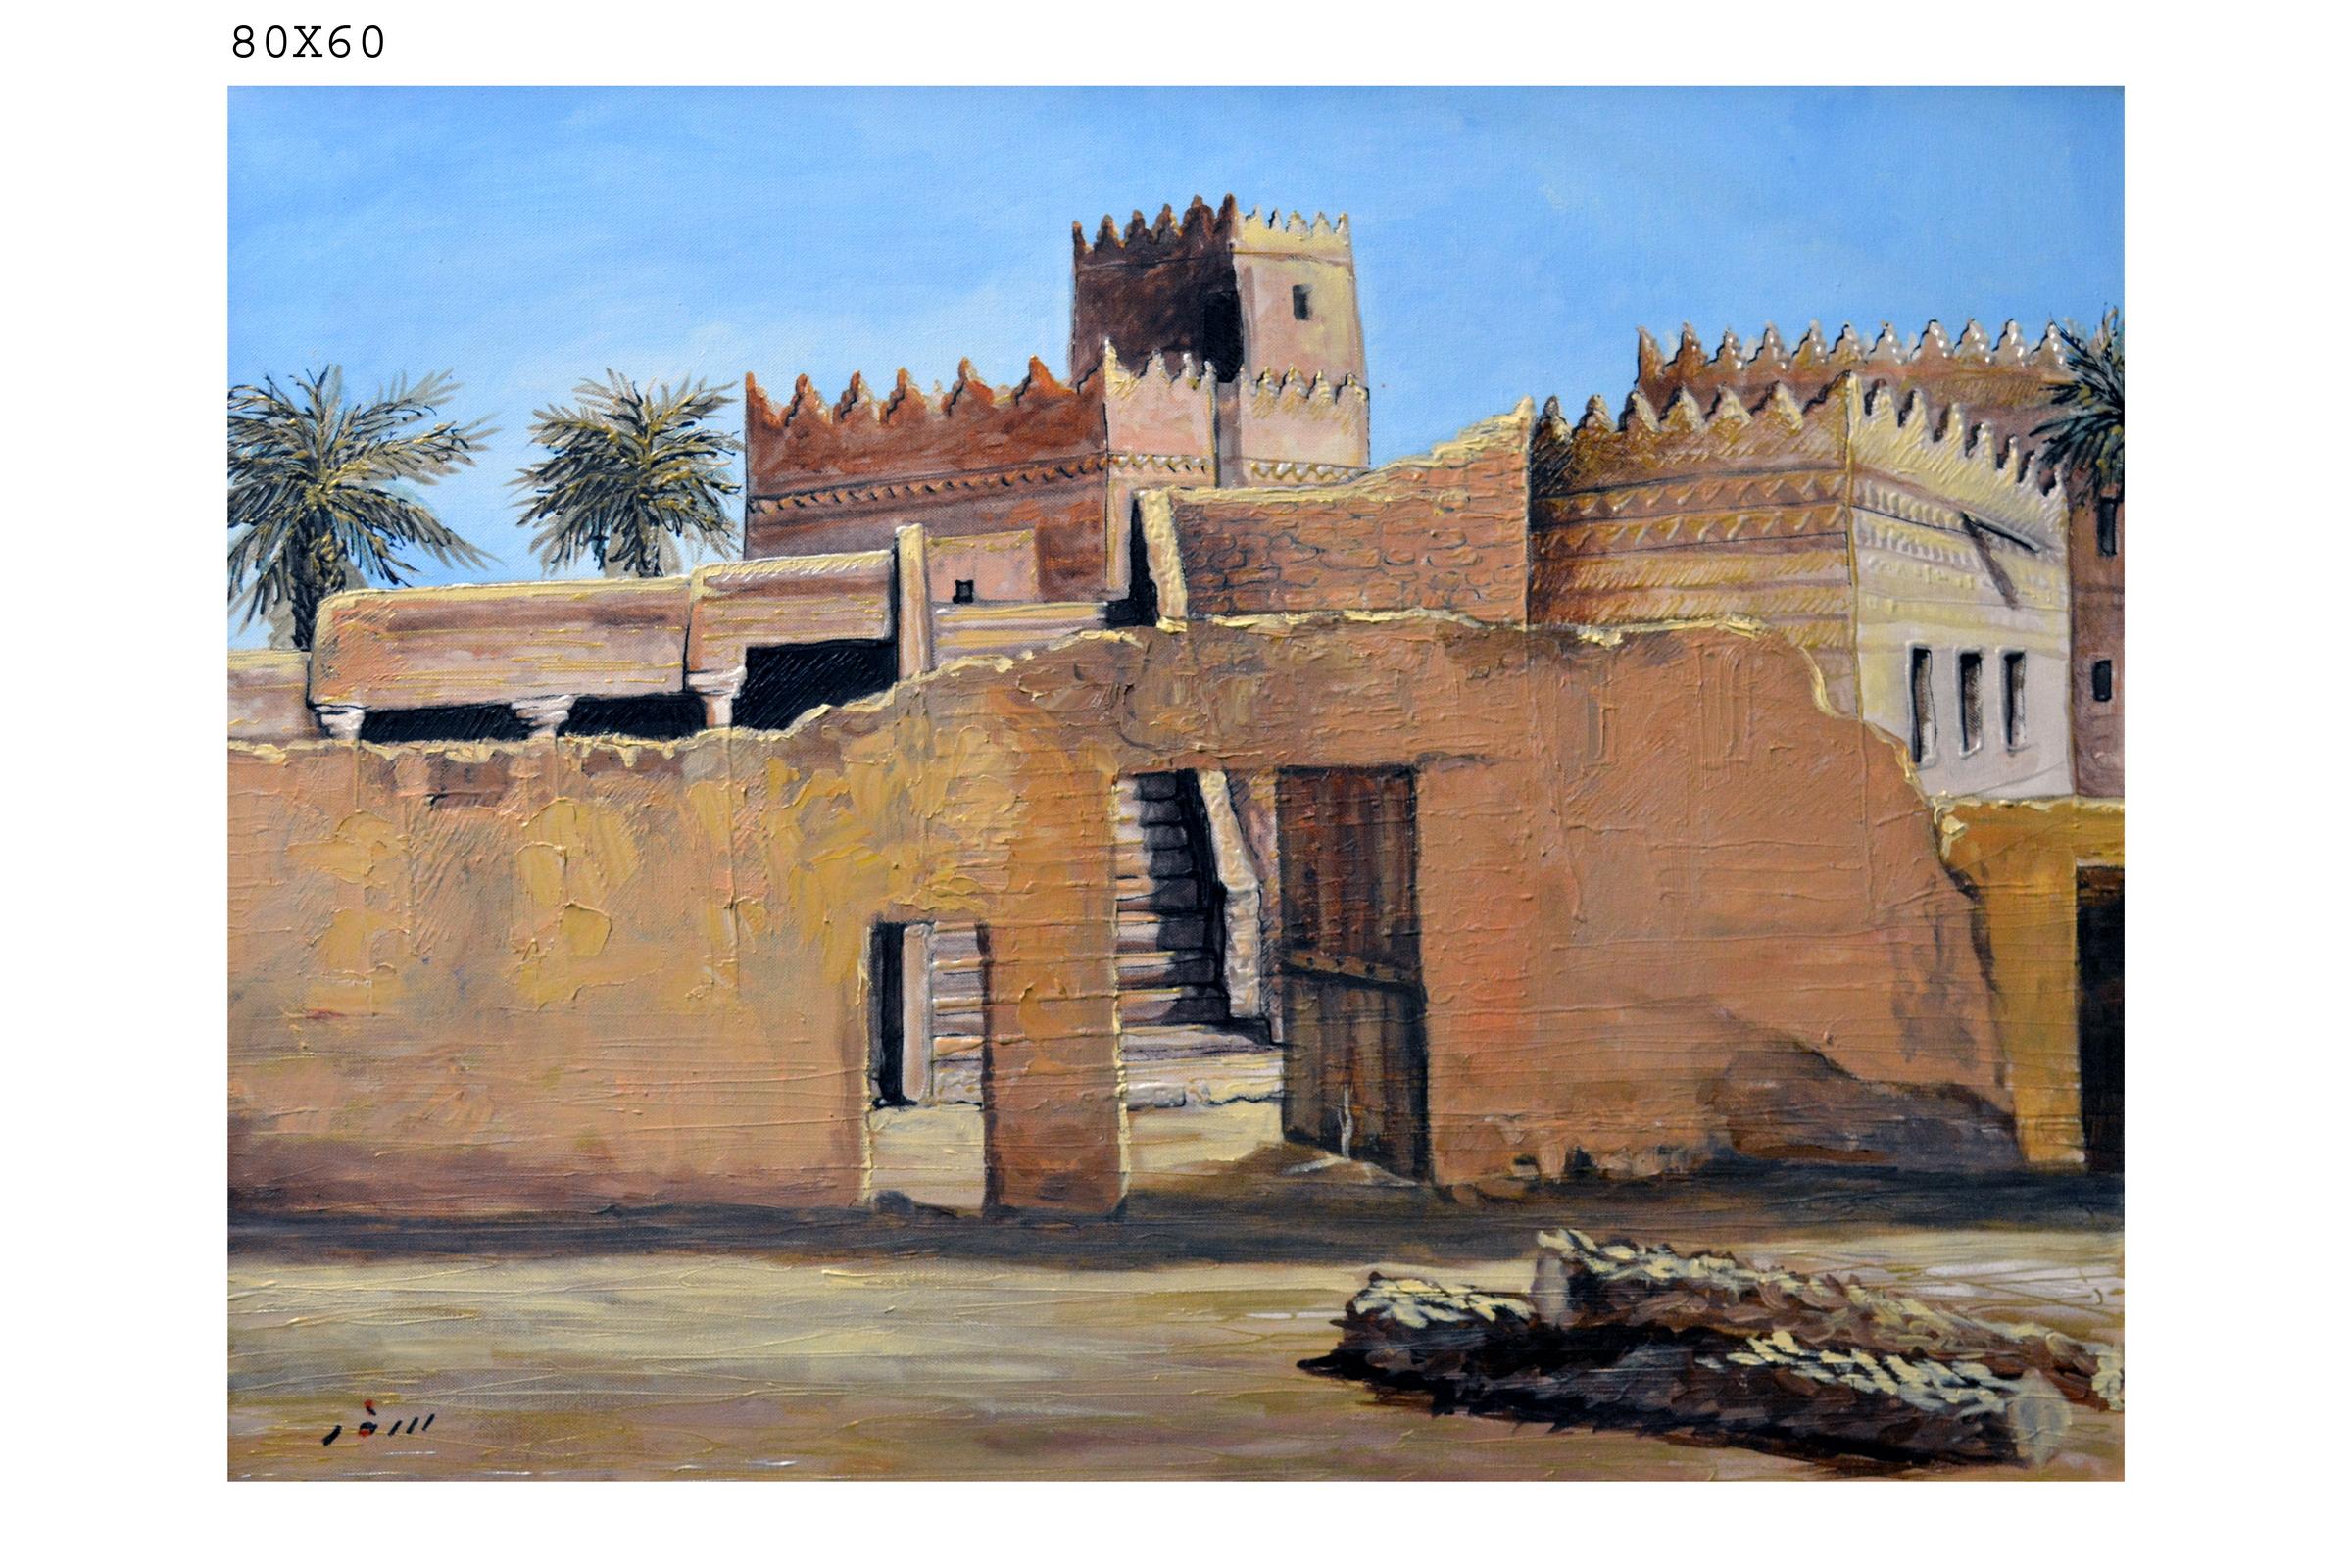 058_94 - artist Bana Safar 80 in 60 oil on canvas - الفنانة بانه سفر.JPG